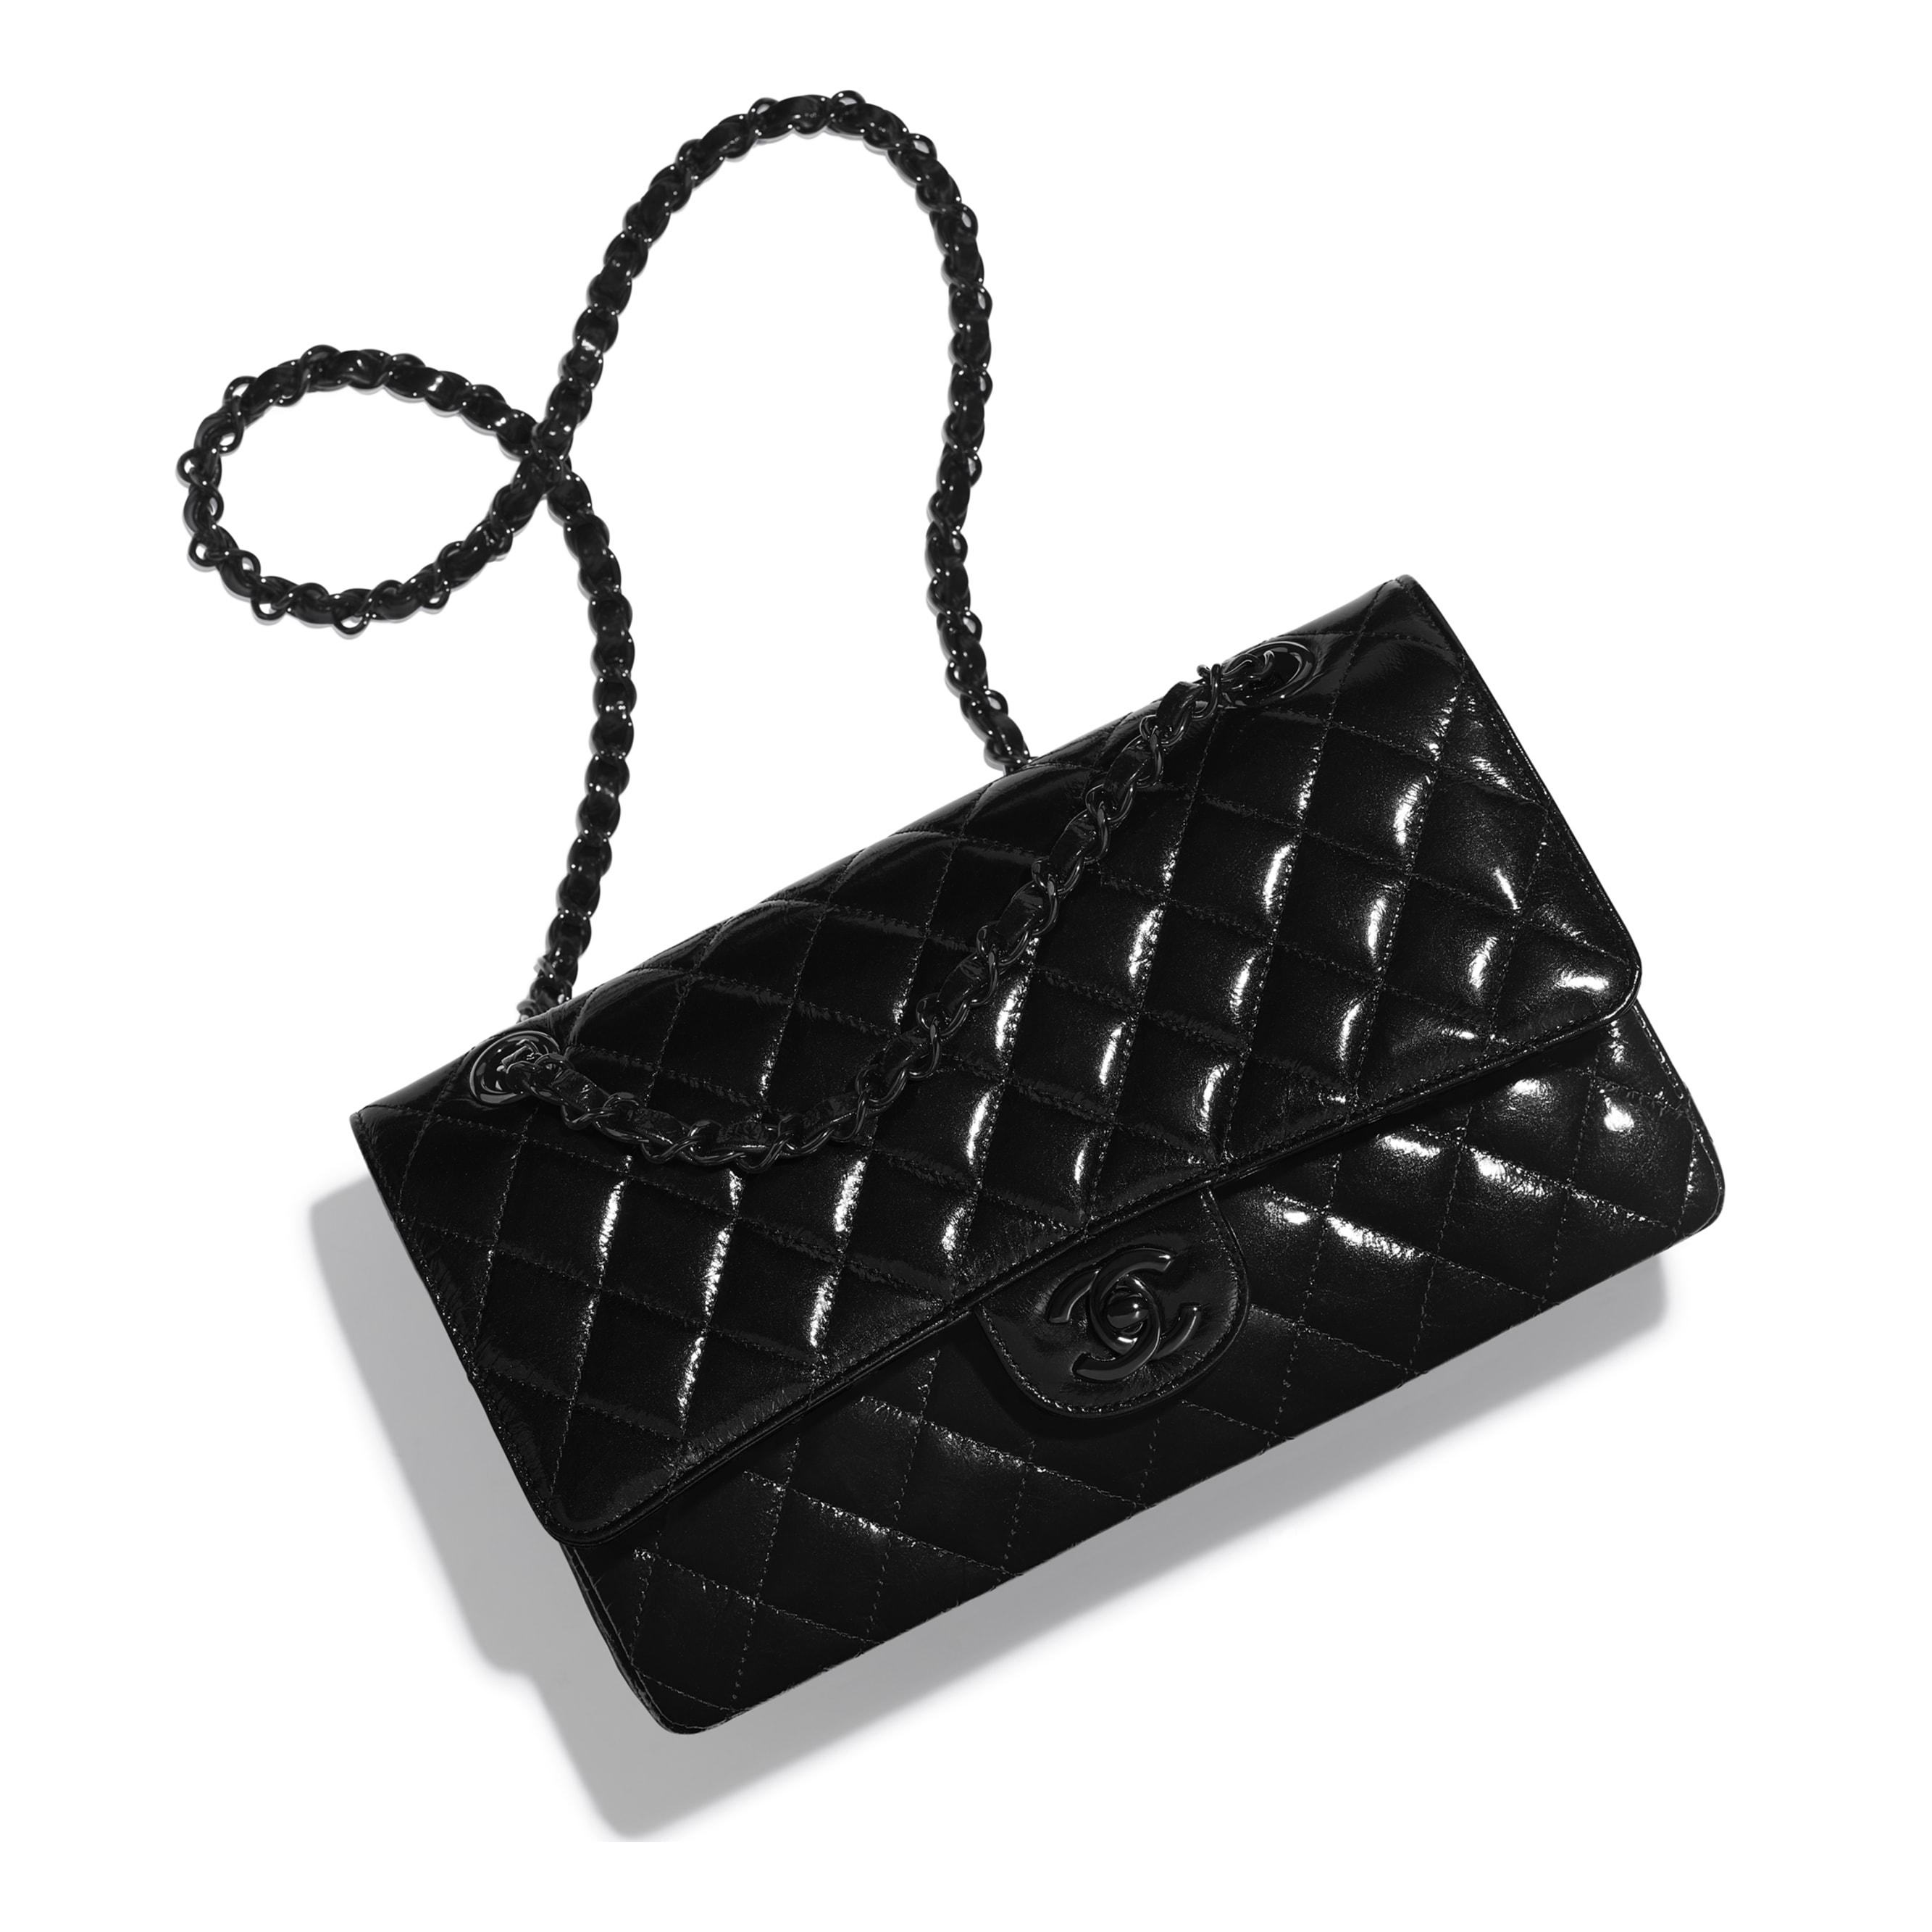 Classic Handbag - Black - Shiny Crumpled Calfksin & Black Metal - Extra view - see standard sized version